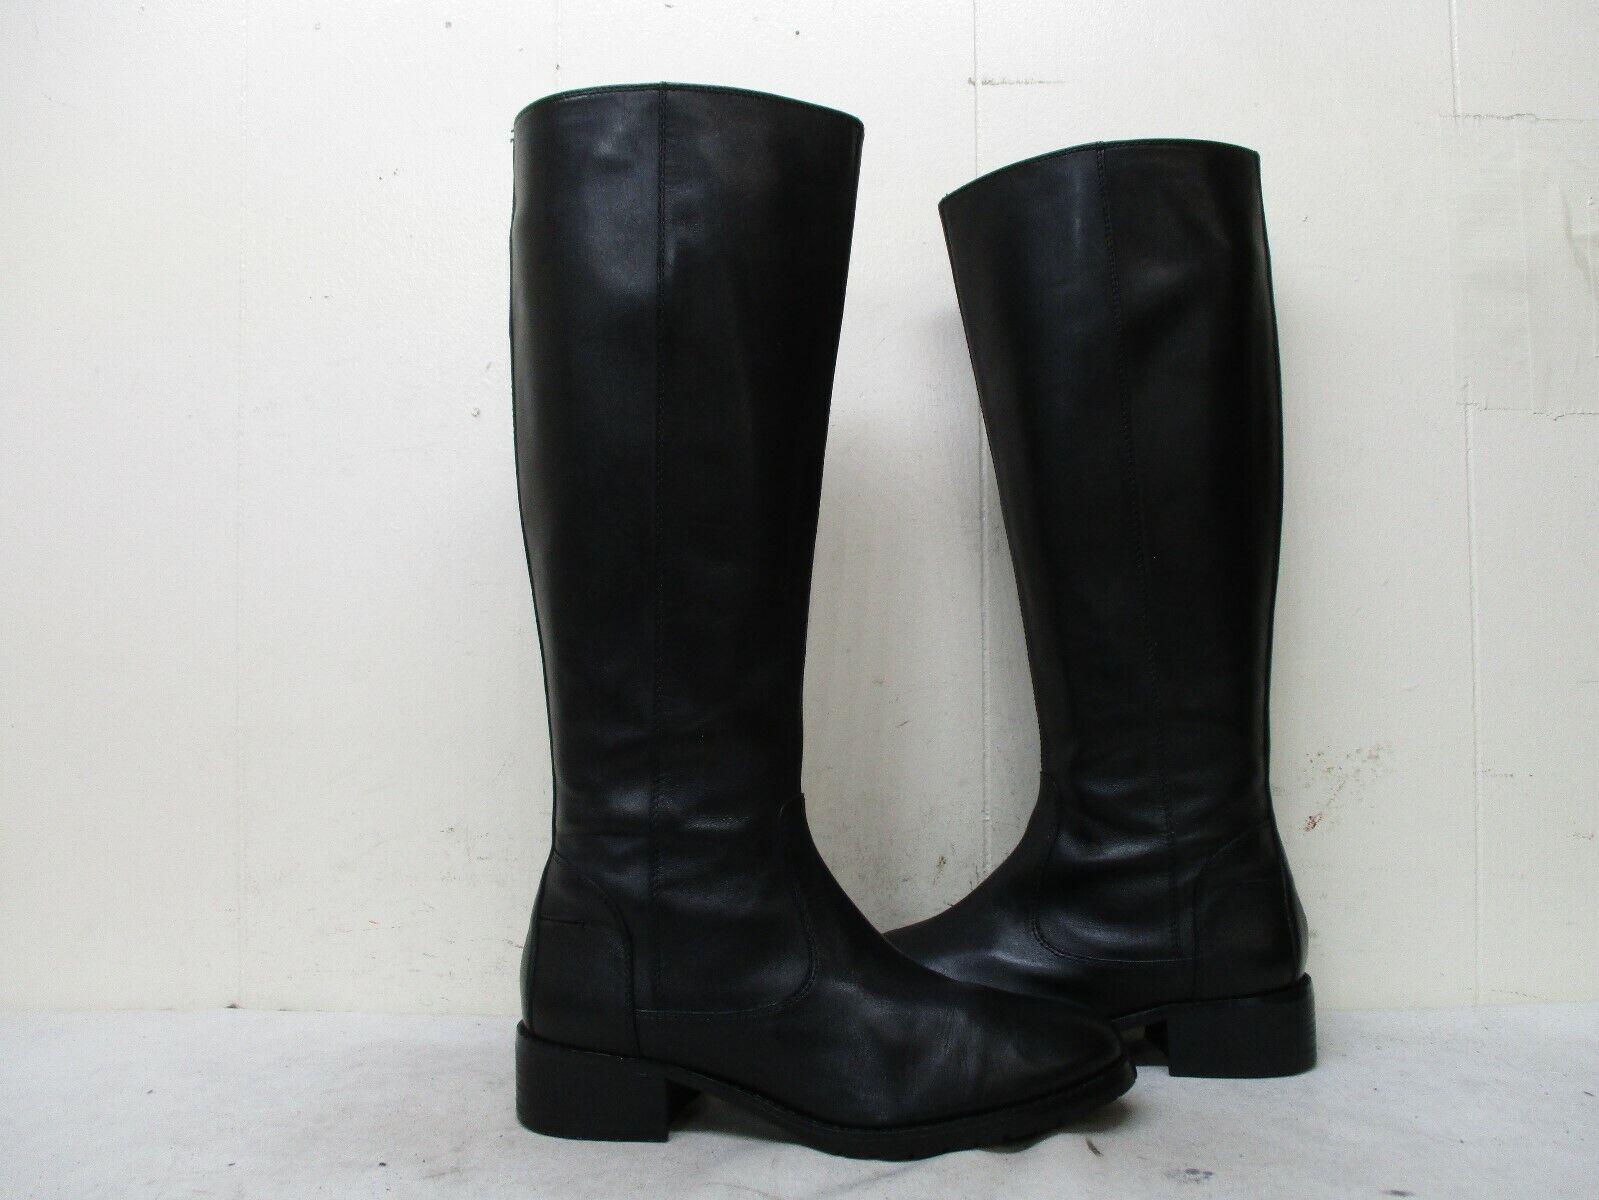 Donald J Pliner Bixbi 3-35 Black Leather Zip Knee Riding Boots Womens Size 7.5 M